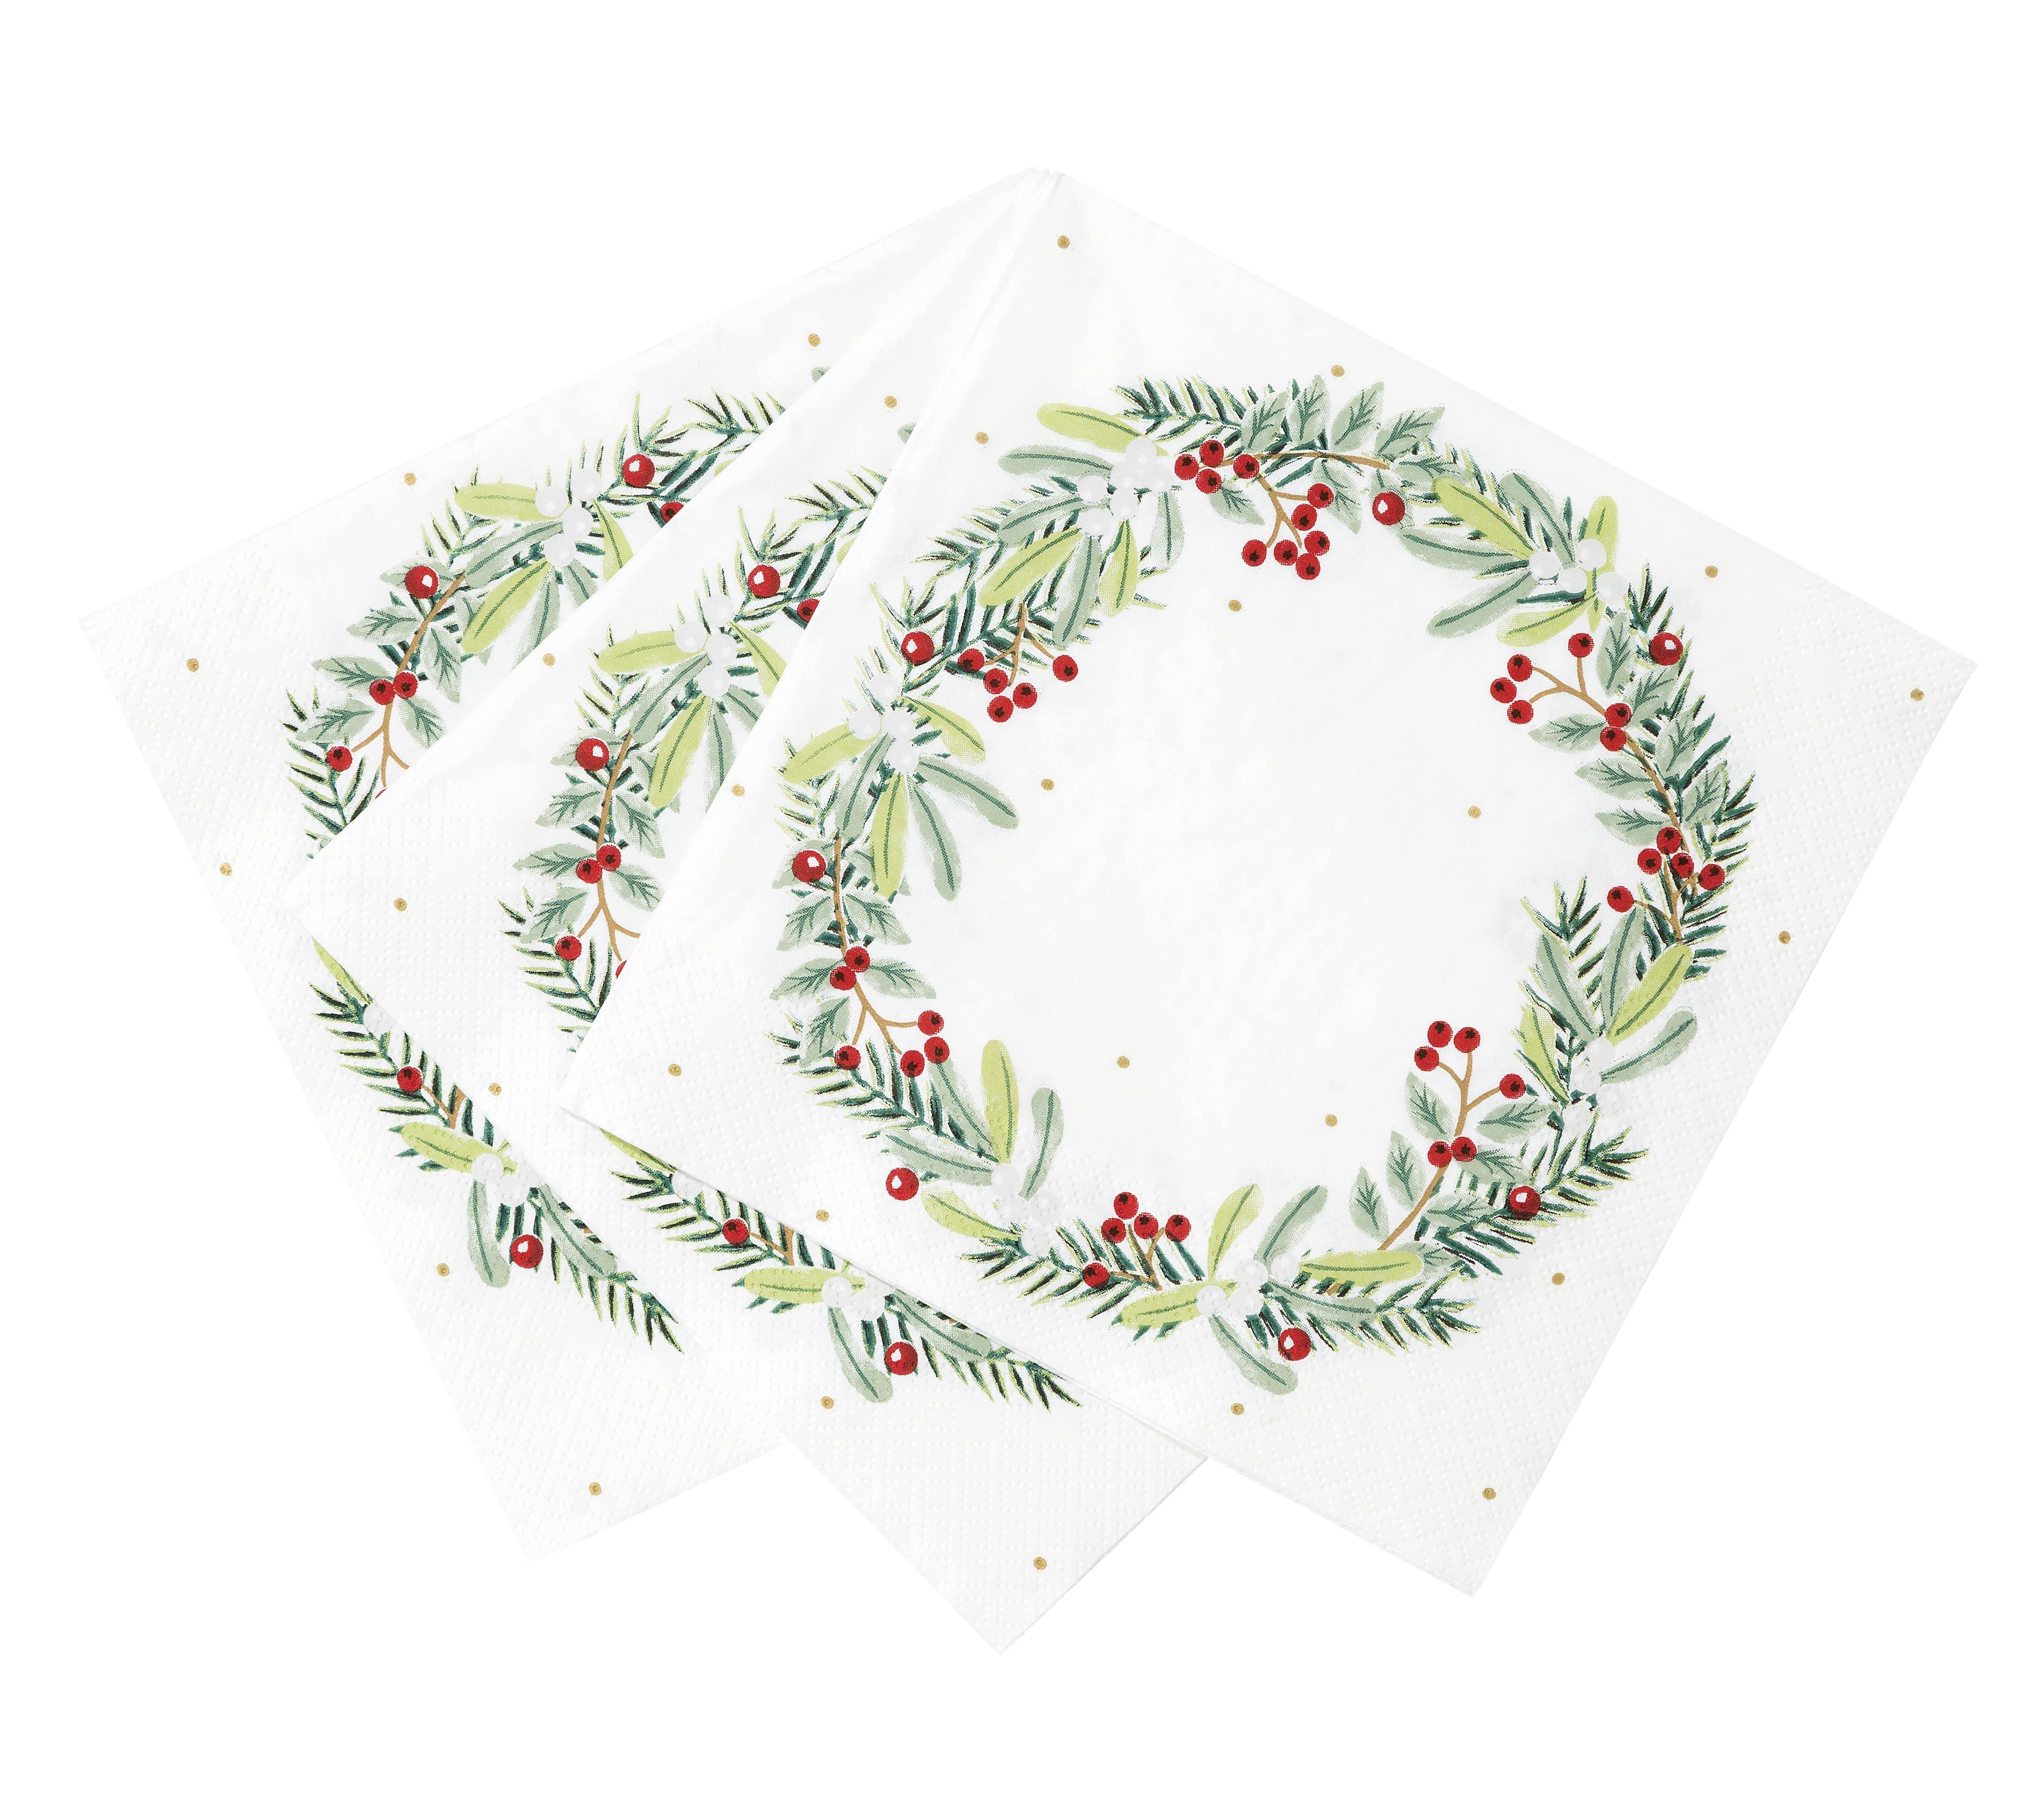 Botanical Wreath Napkins - was £3.75